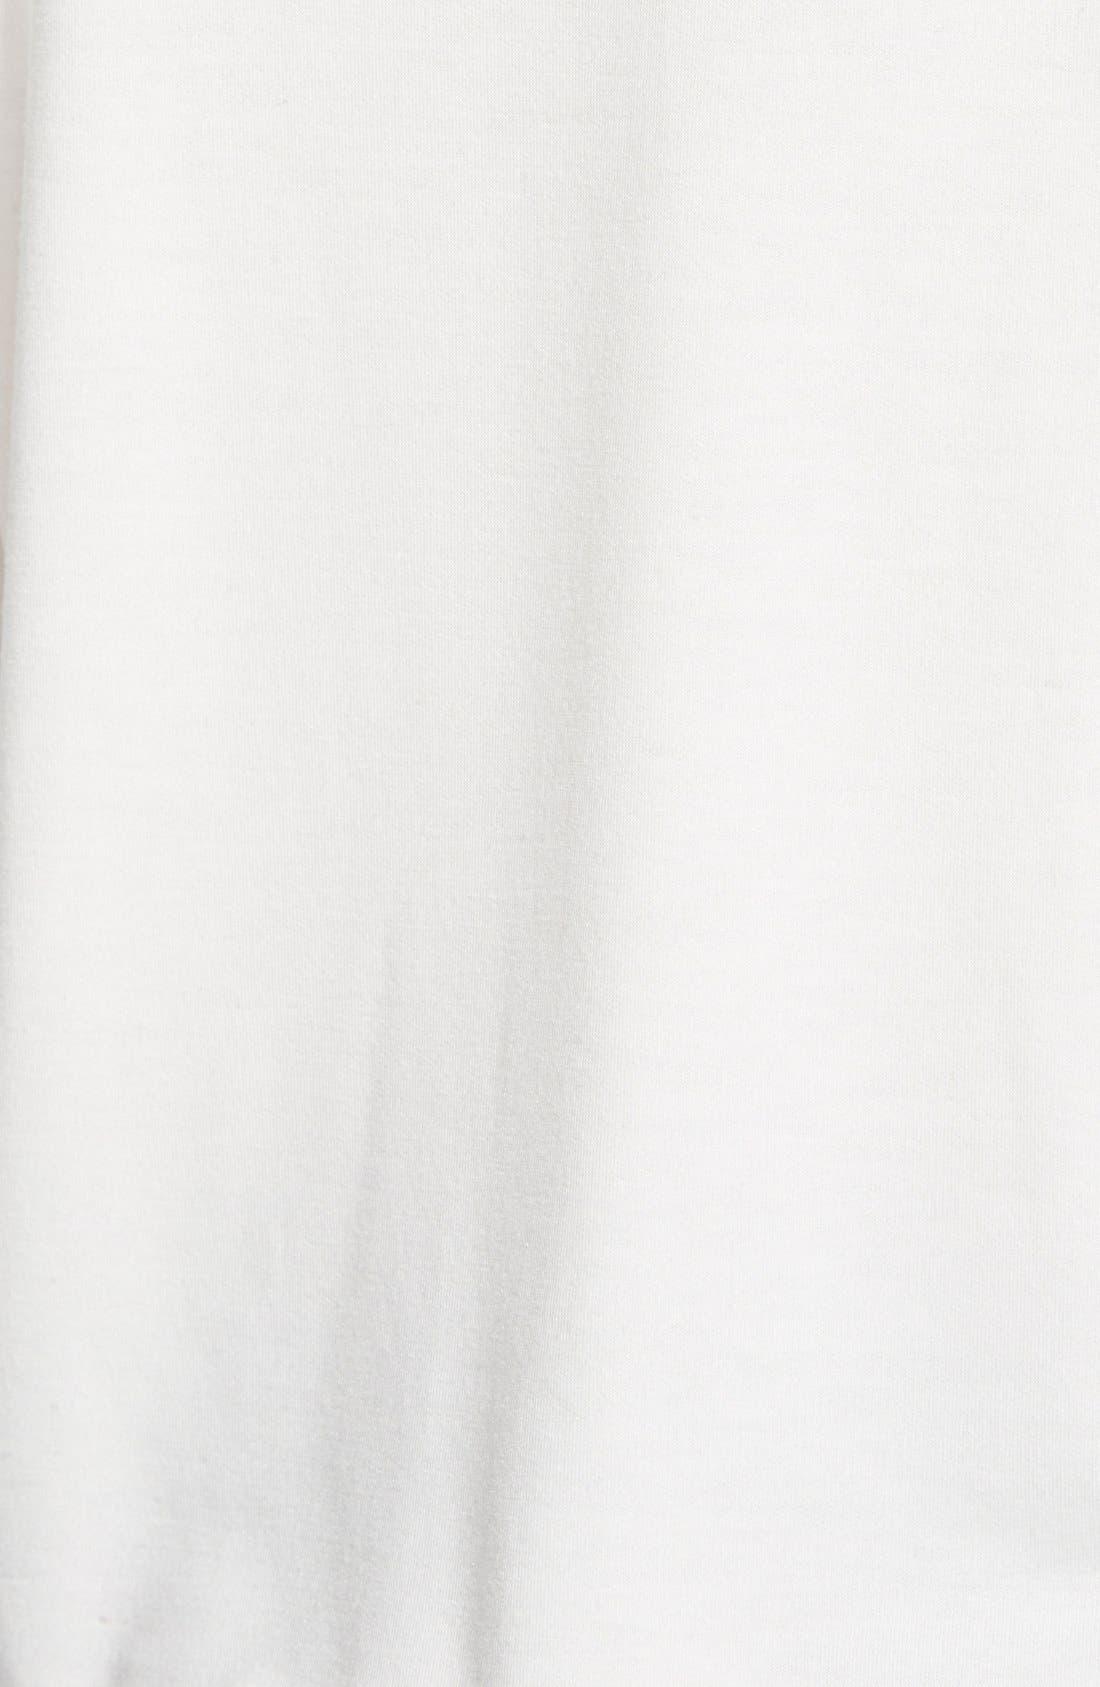 Alternate Image 3  - Ten Sixty Sherman 'I'm a Cuddler' Graphic Long Sleeve Tee (Juniors)